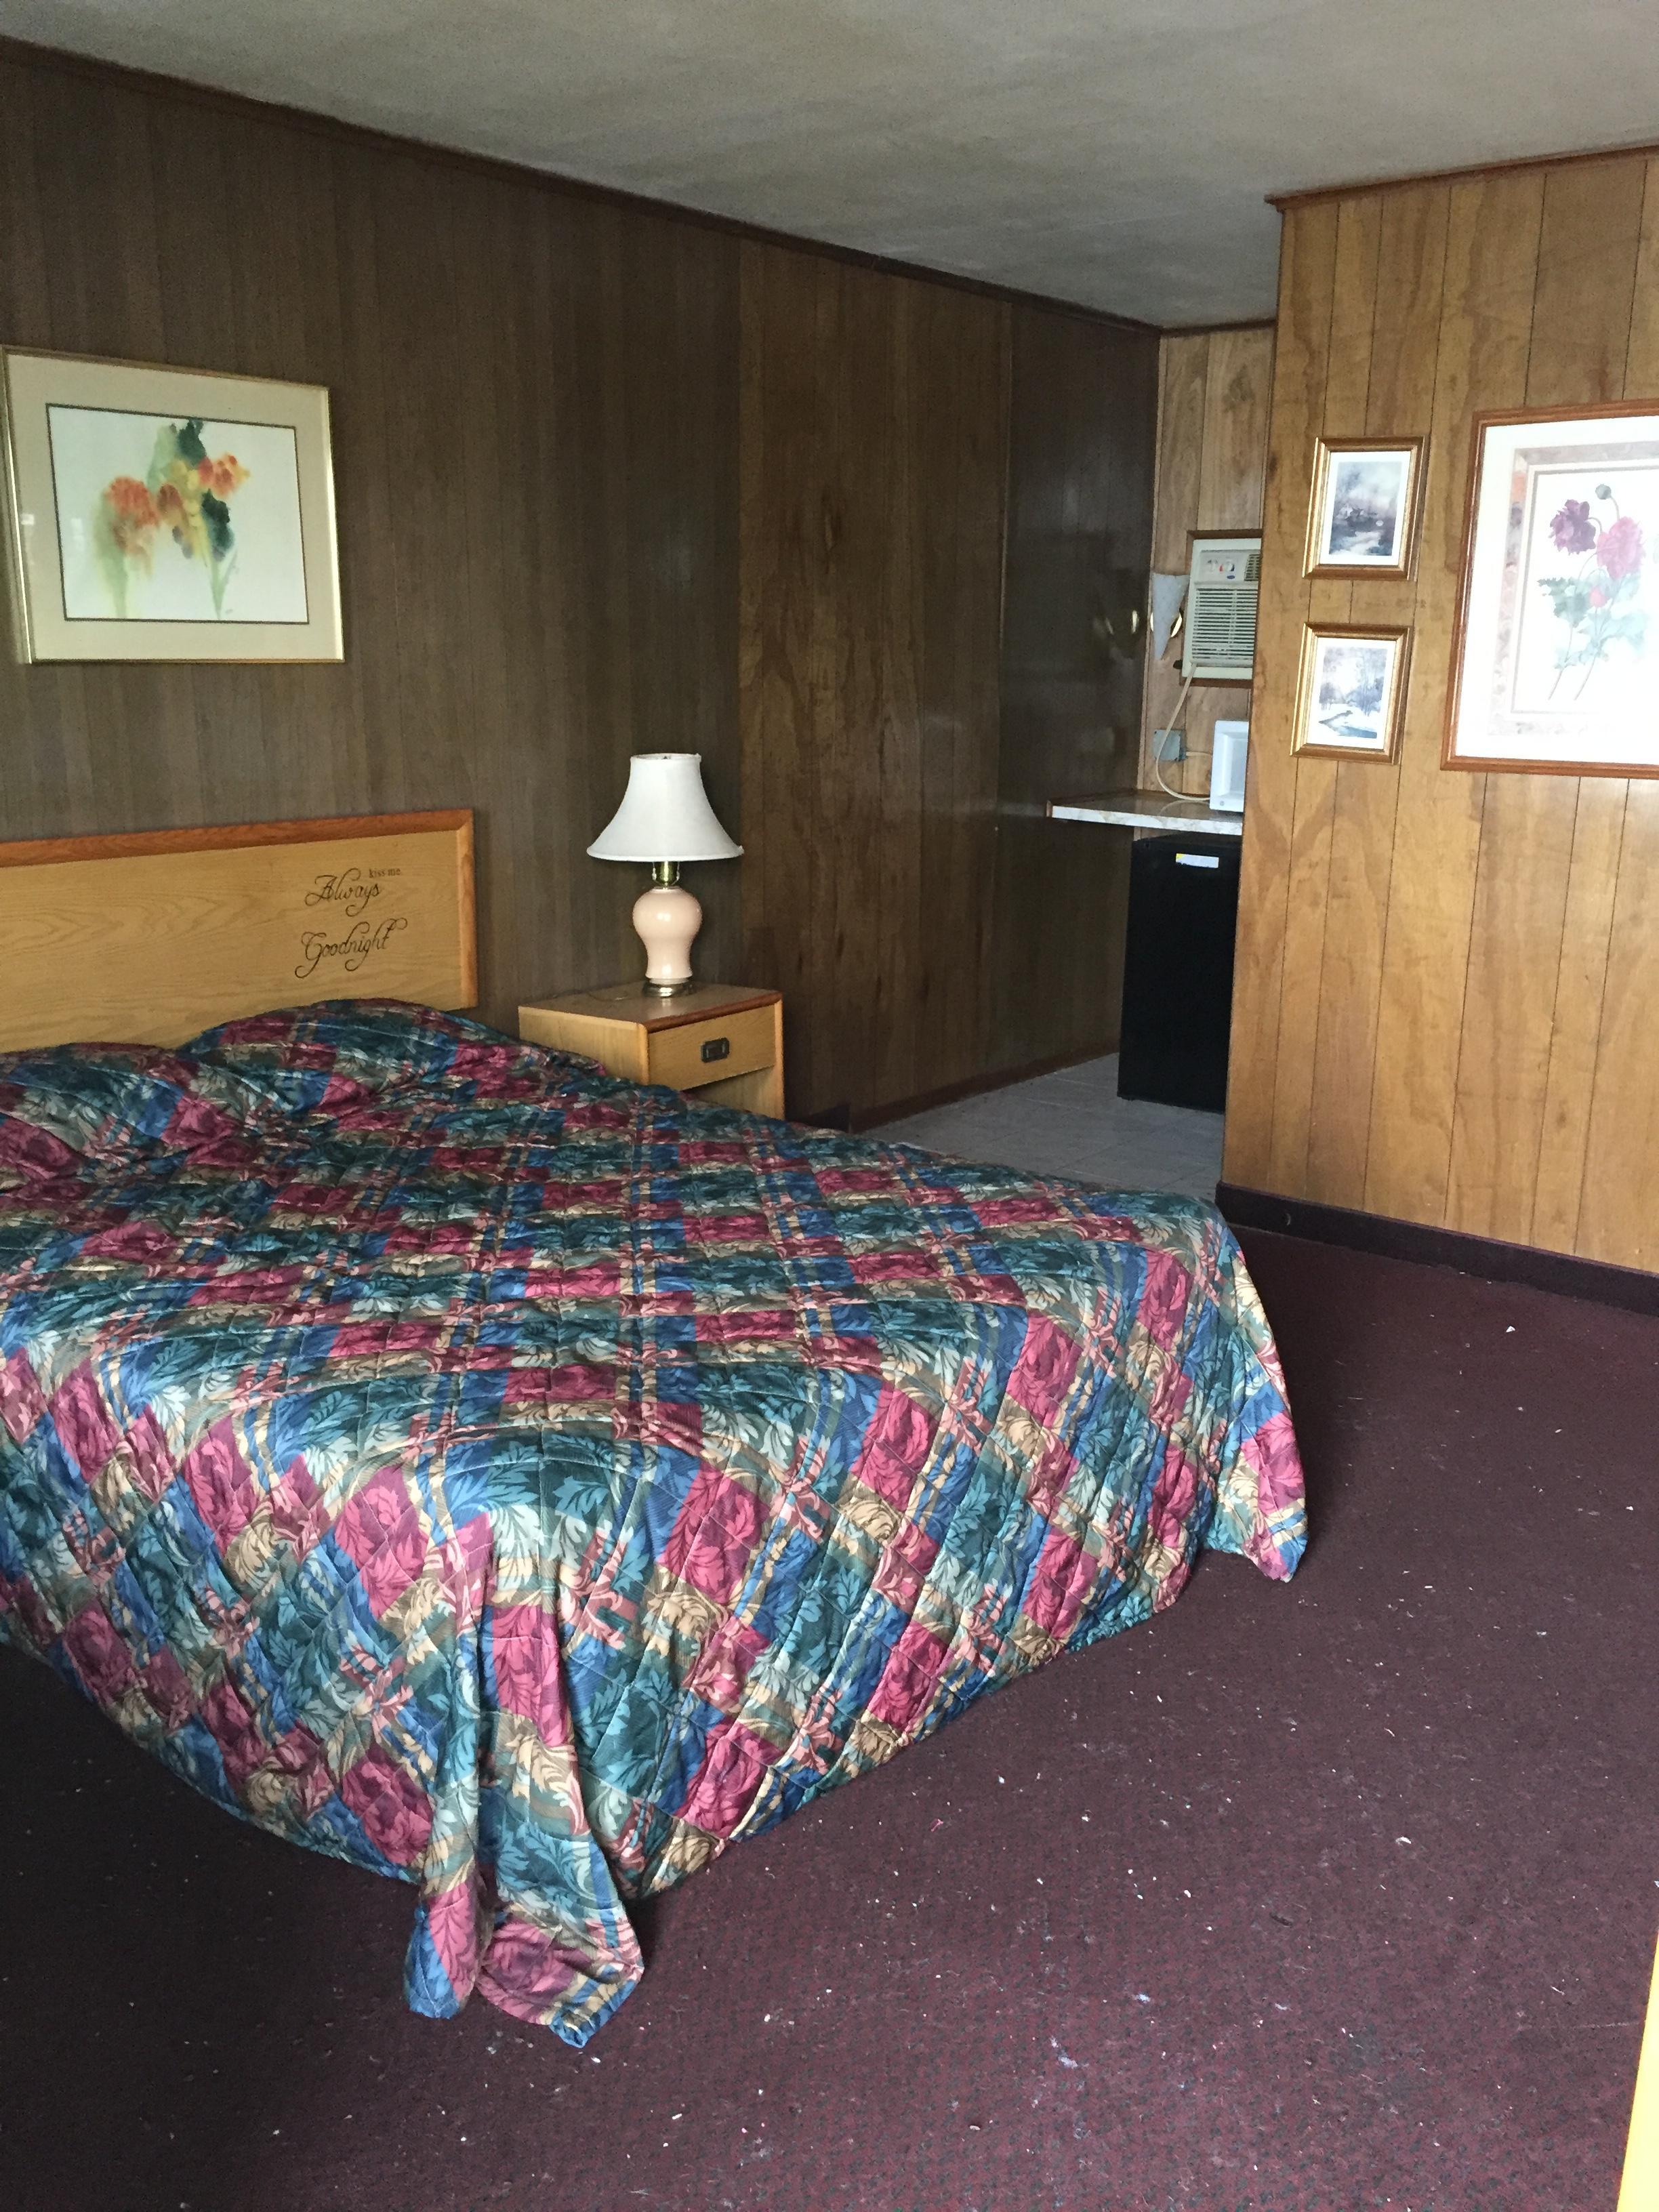 Gold Star Motel image 0